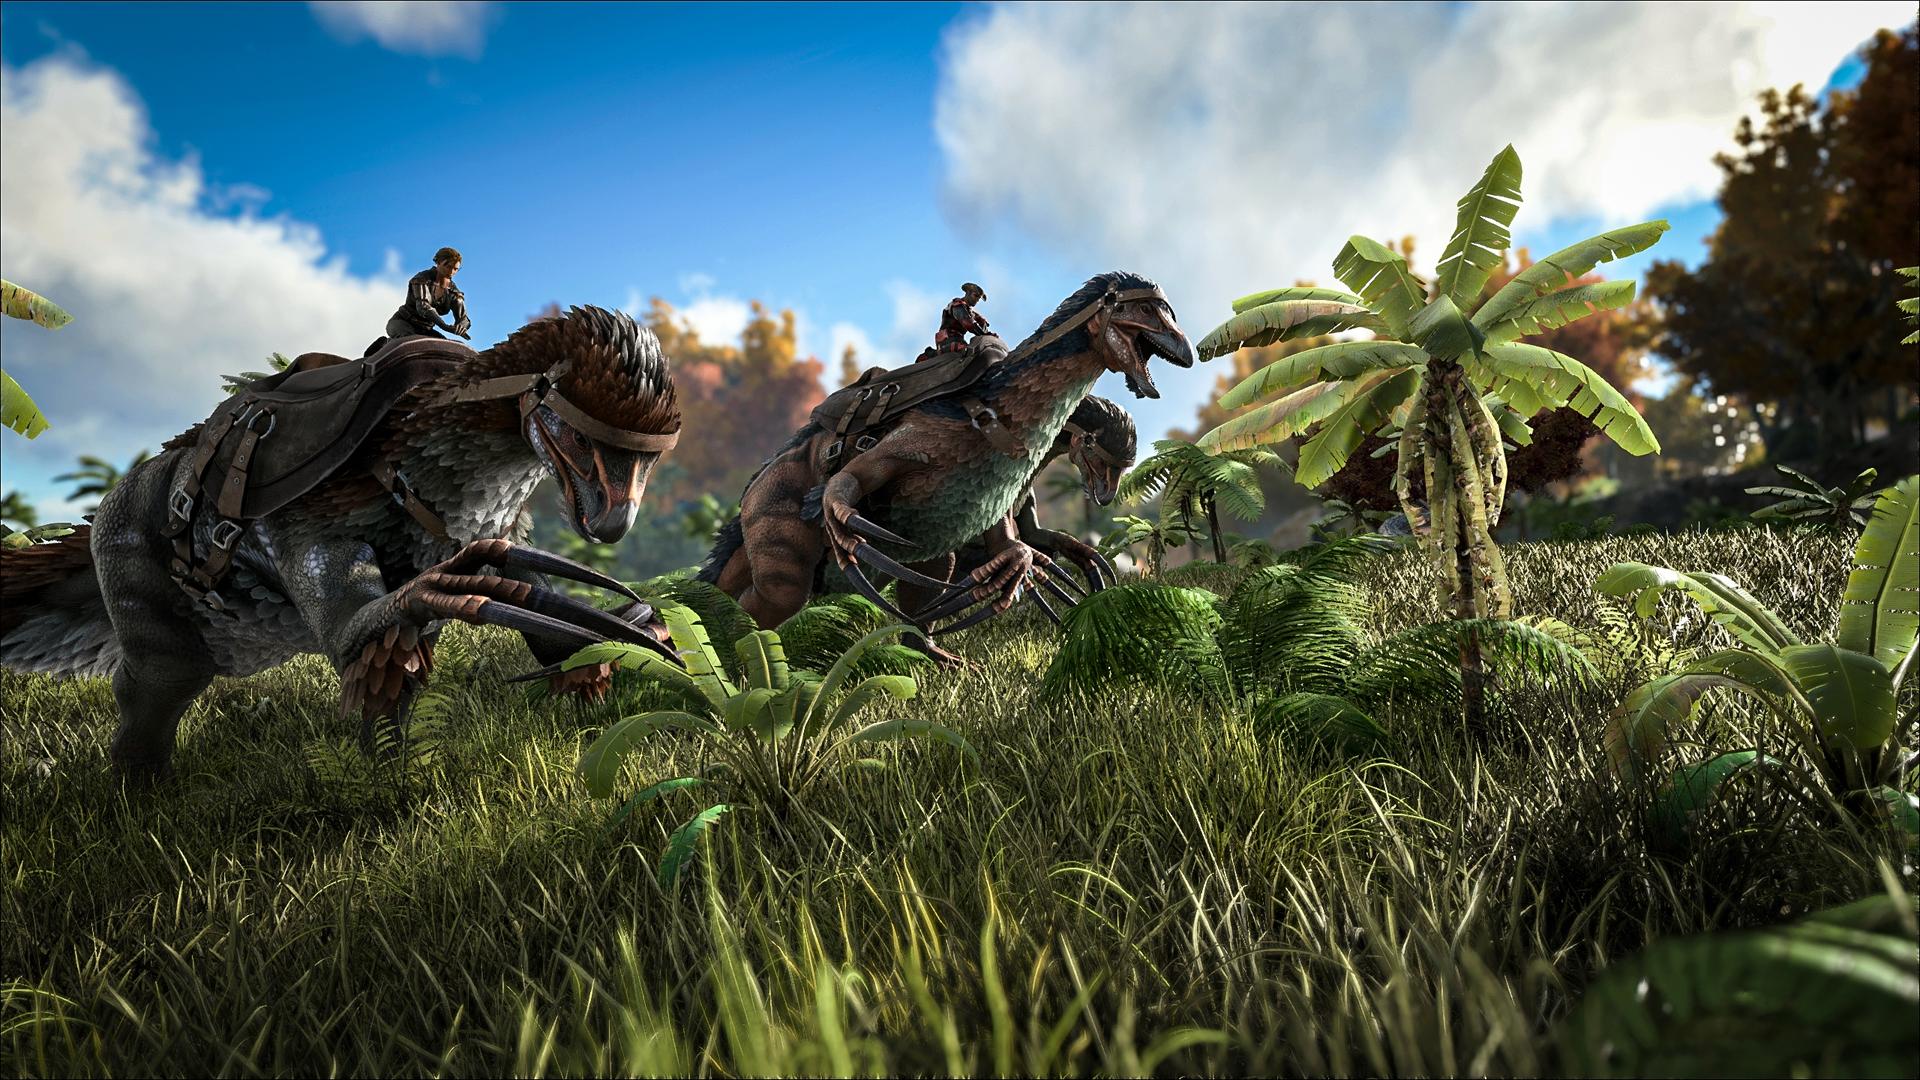 Ark: Survival Evolved's next beginner server wipe is set for March